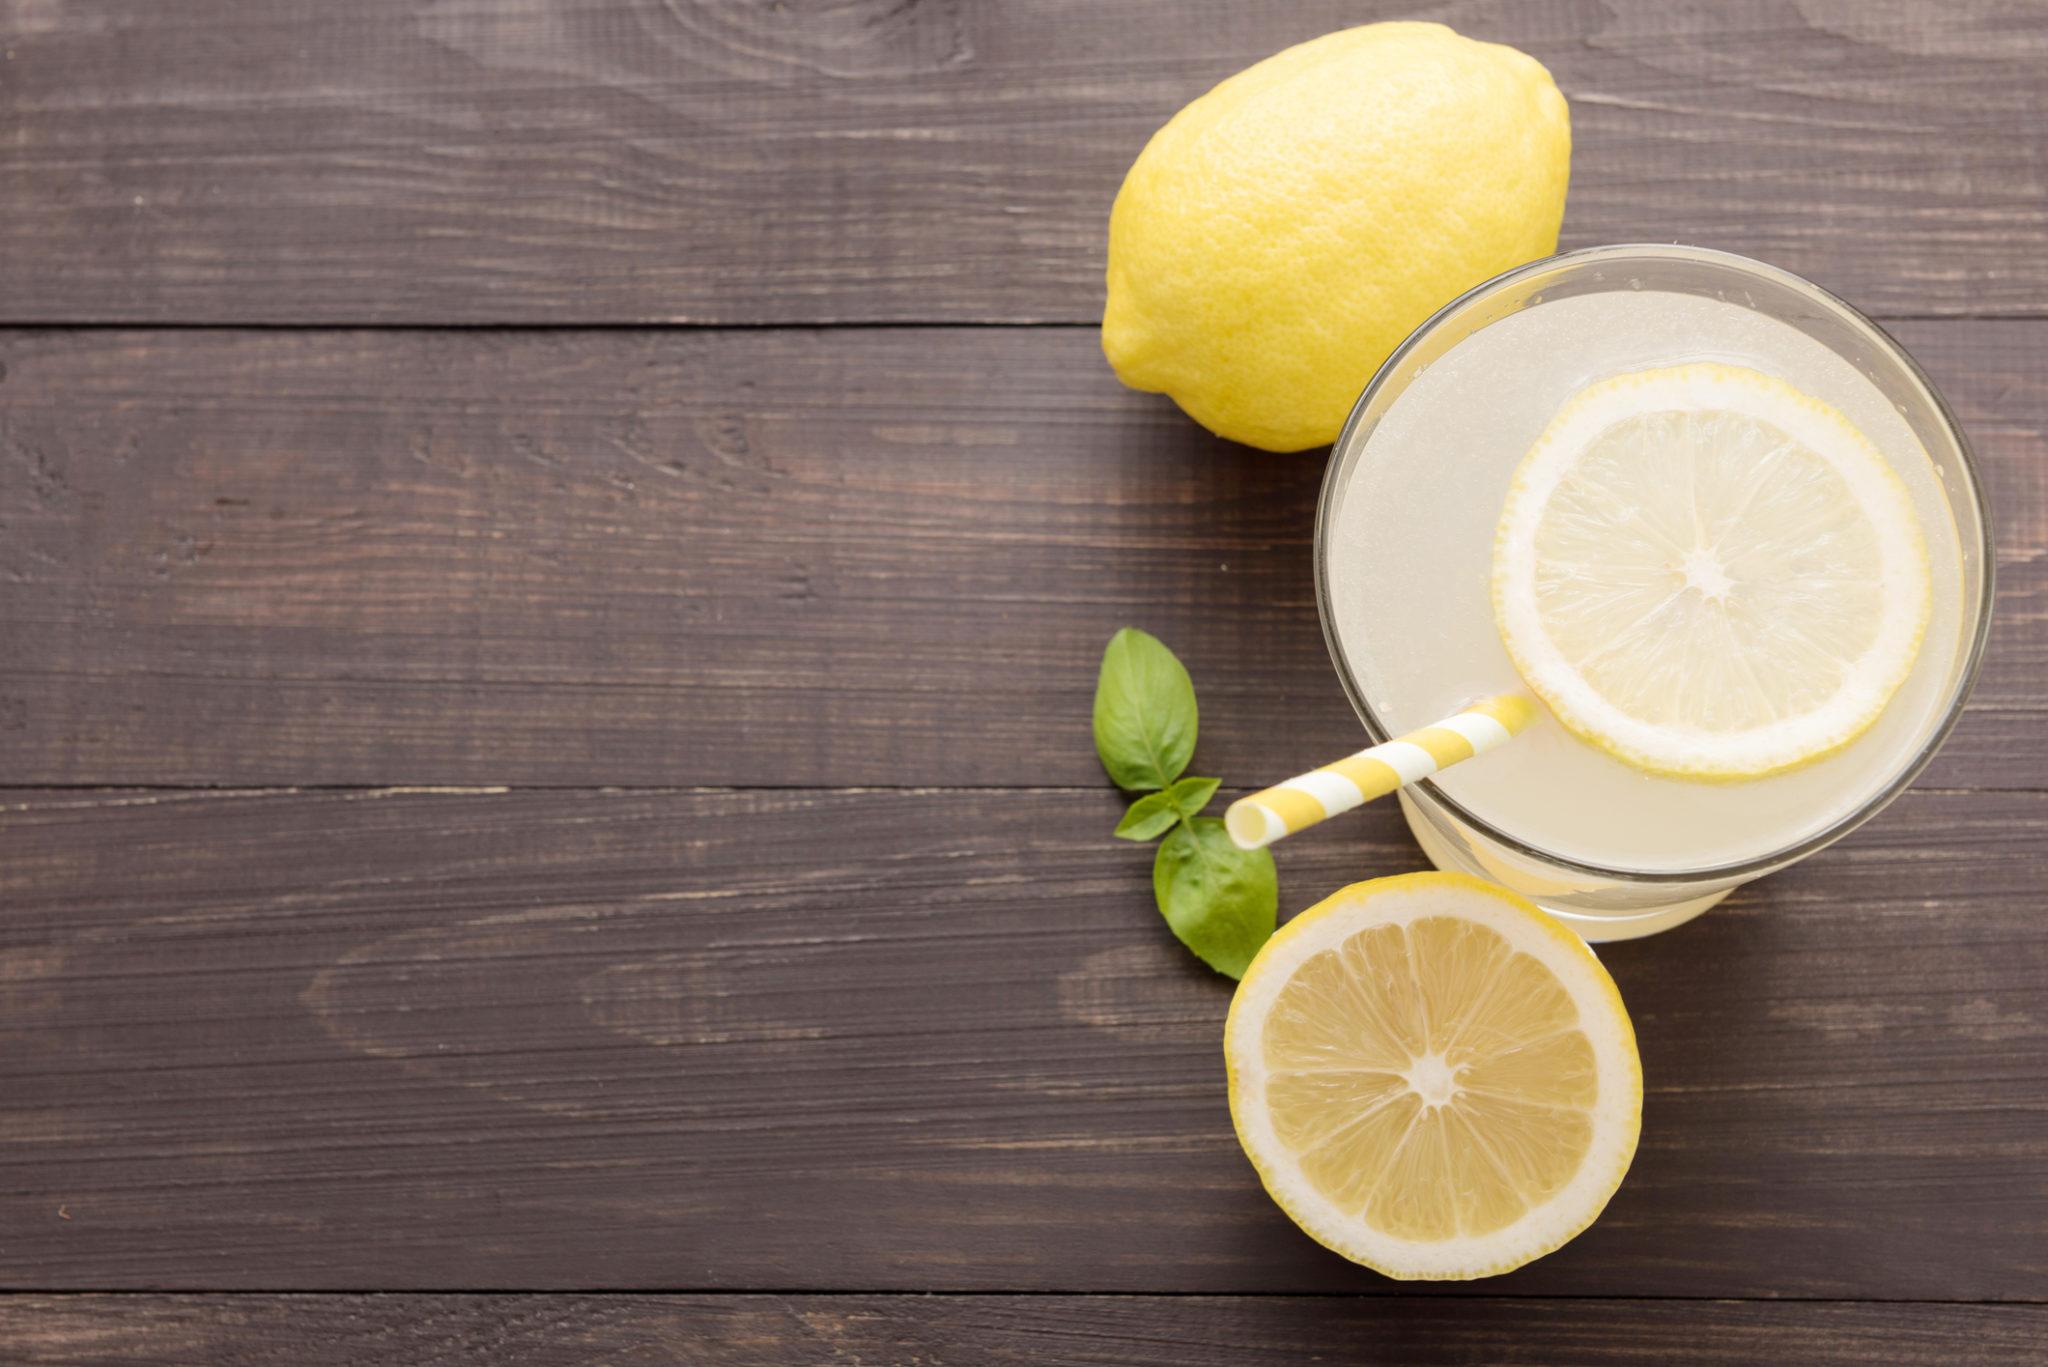 La limonade : 100% saine et naturelle?